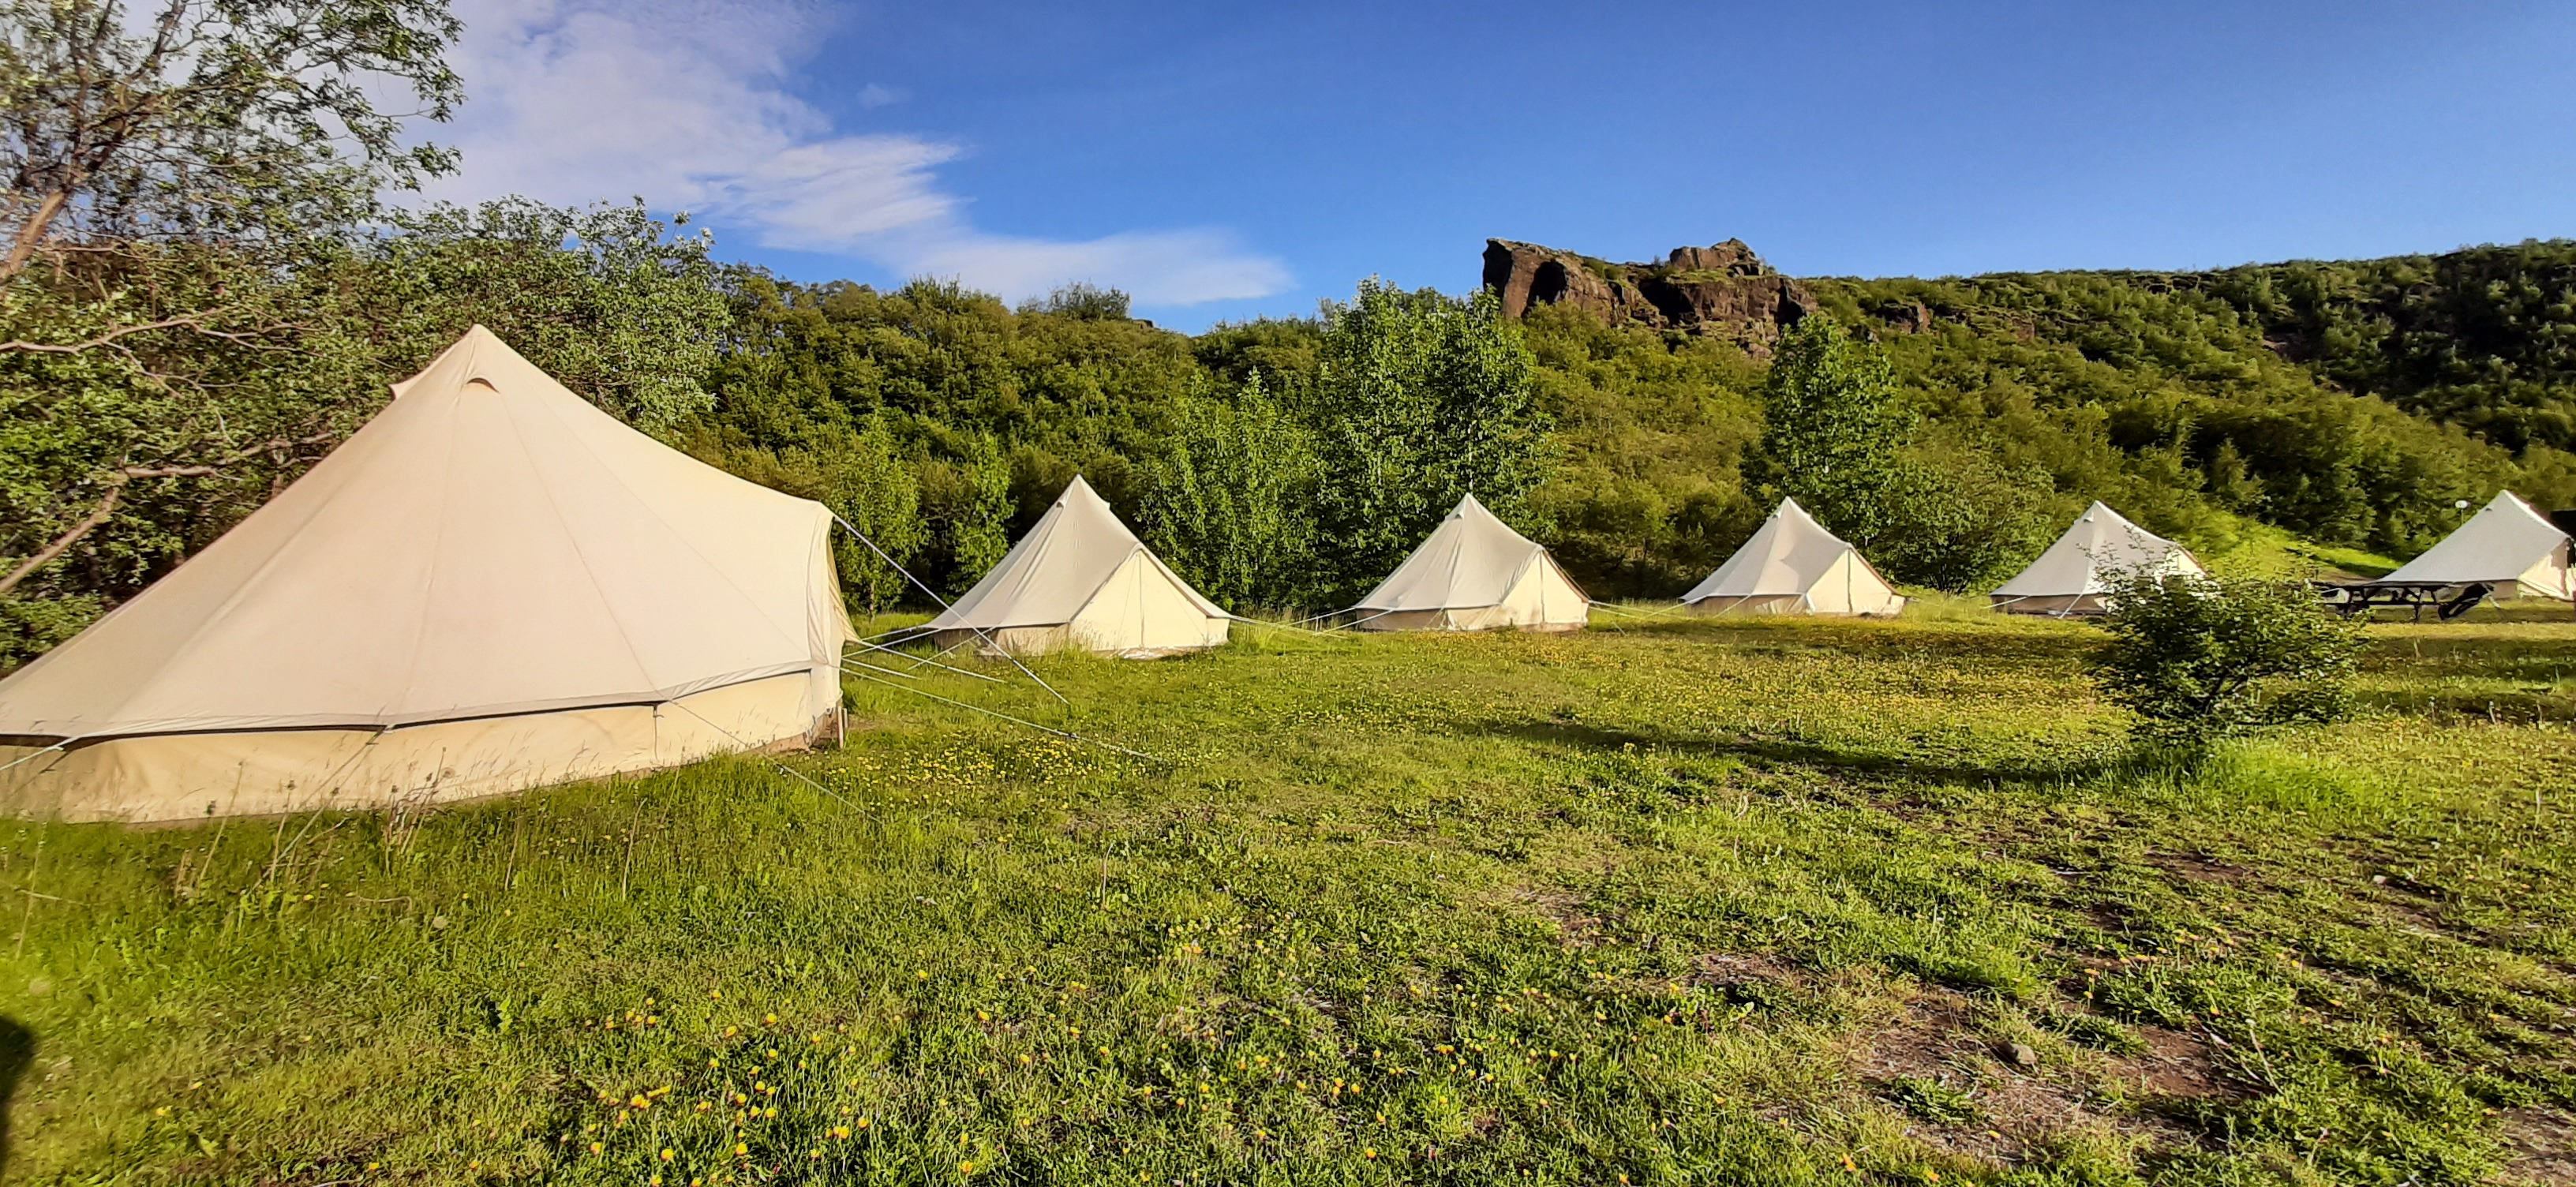 Húsadalur-Volcano Huts, Thorsmork